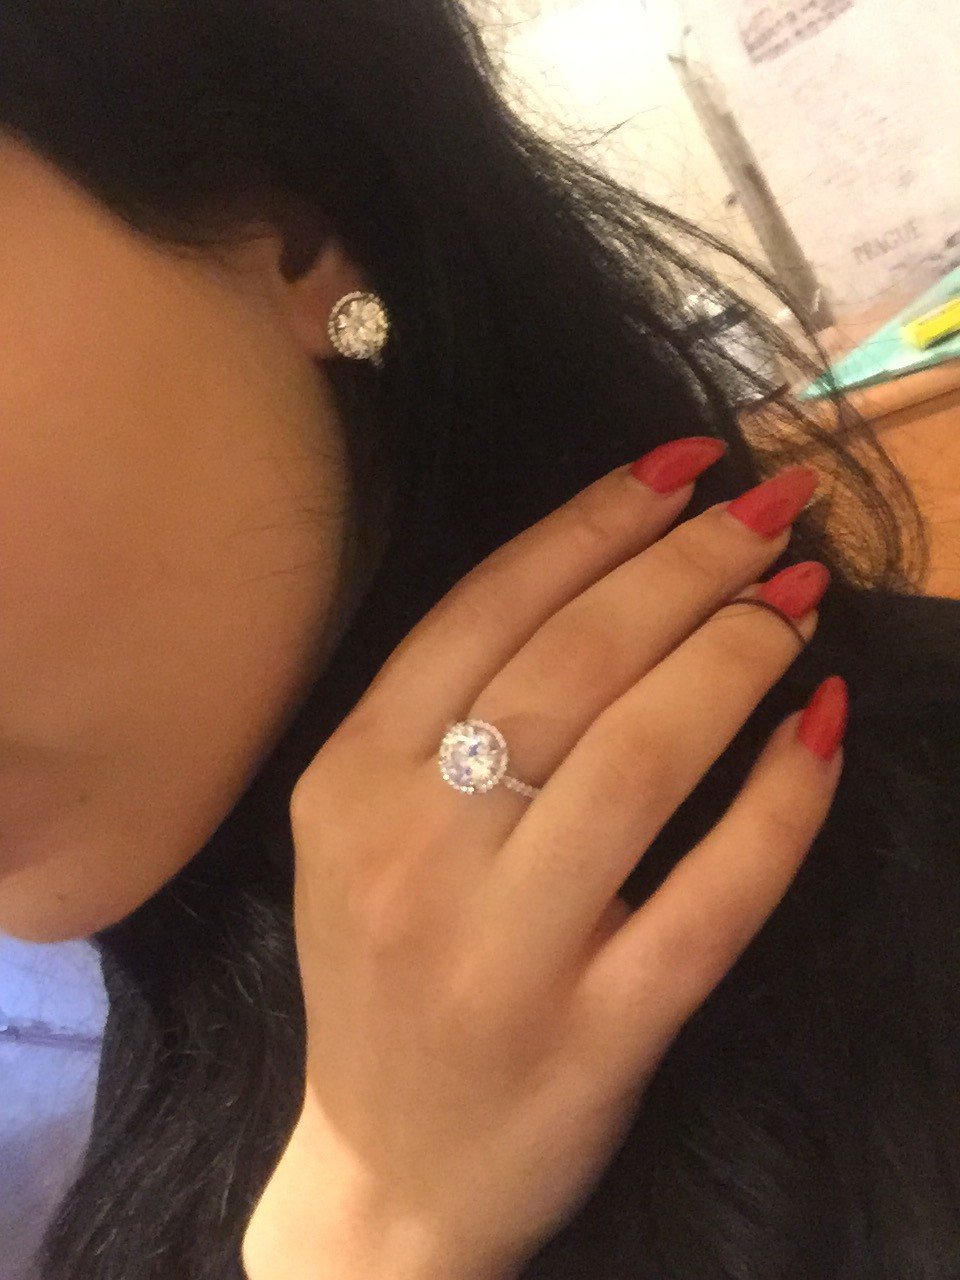 Красивое кольцо))))))